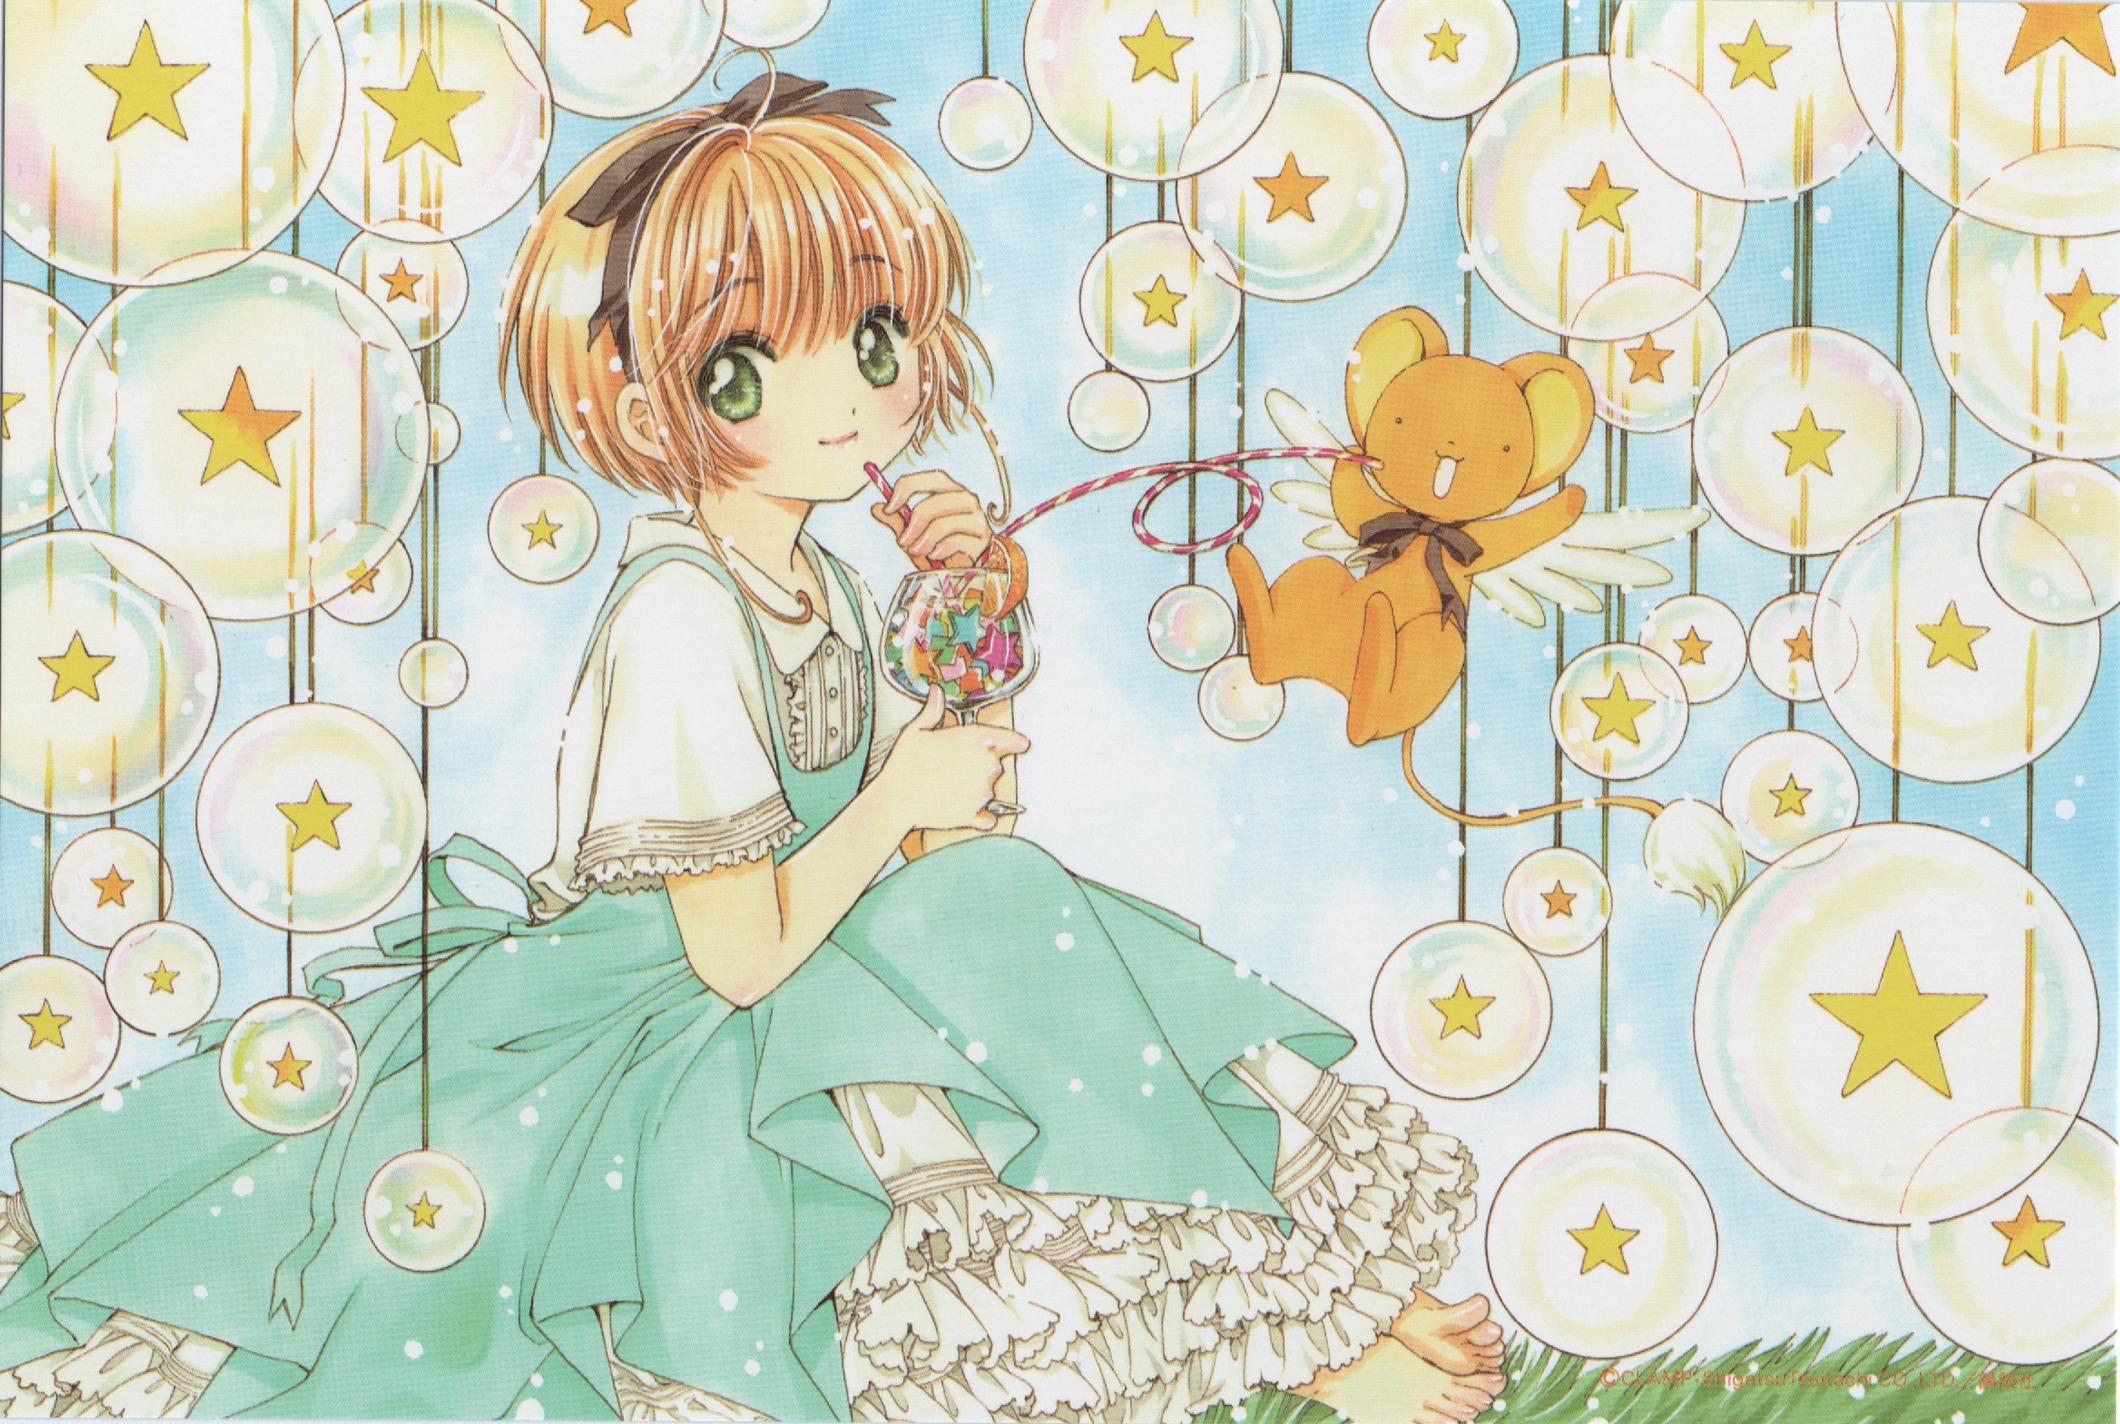 Cardcaptor sakura clear card hen zerochan anime image board - Cardcaptor sakura wallpaper ...